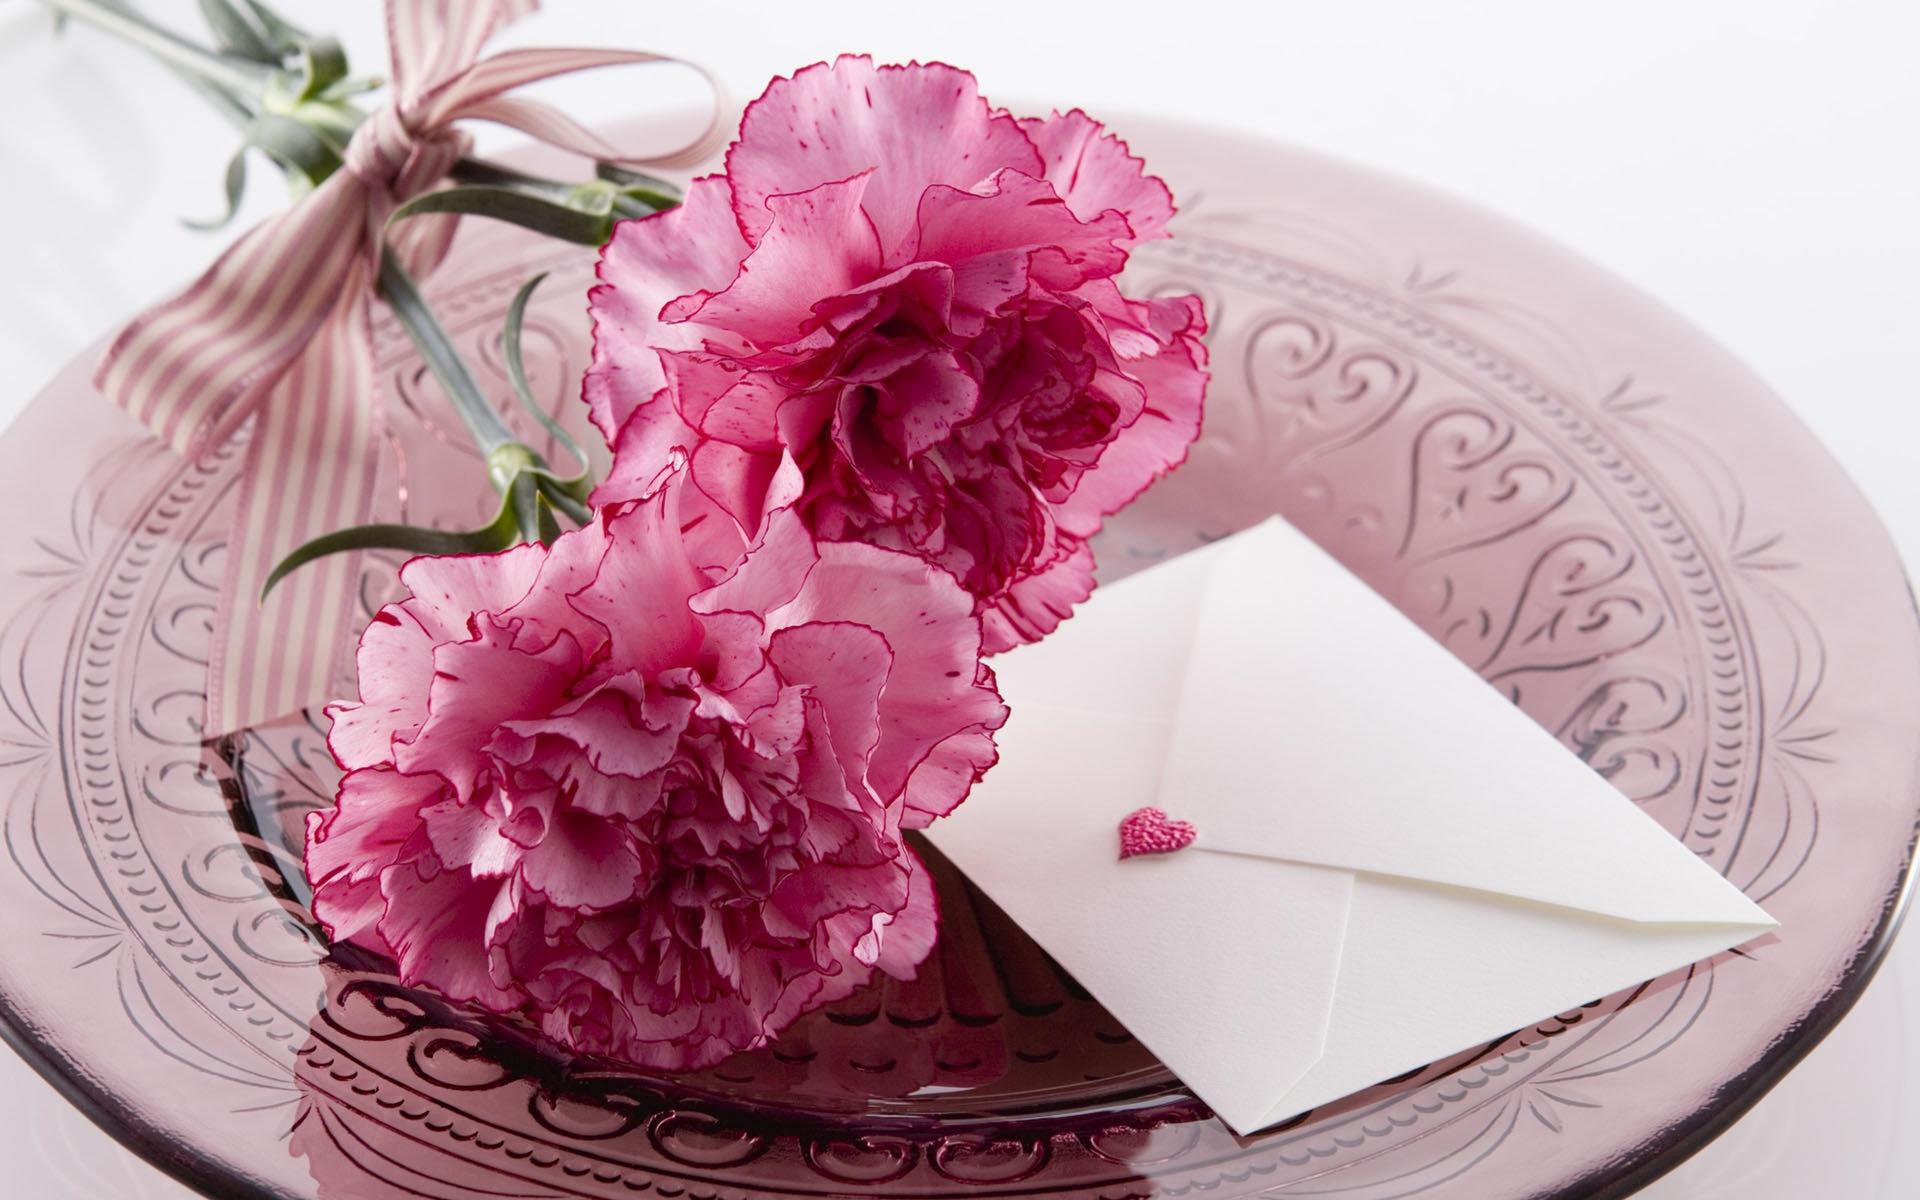 carnation download wallpaper